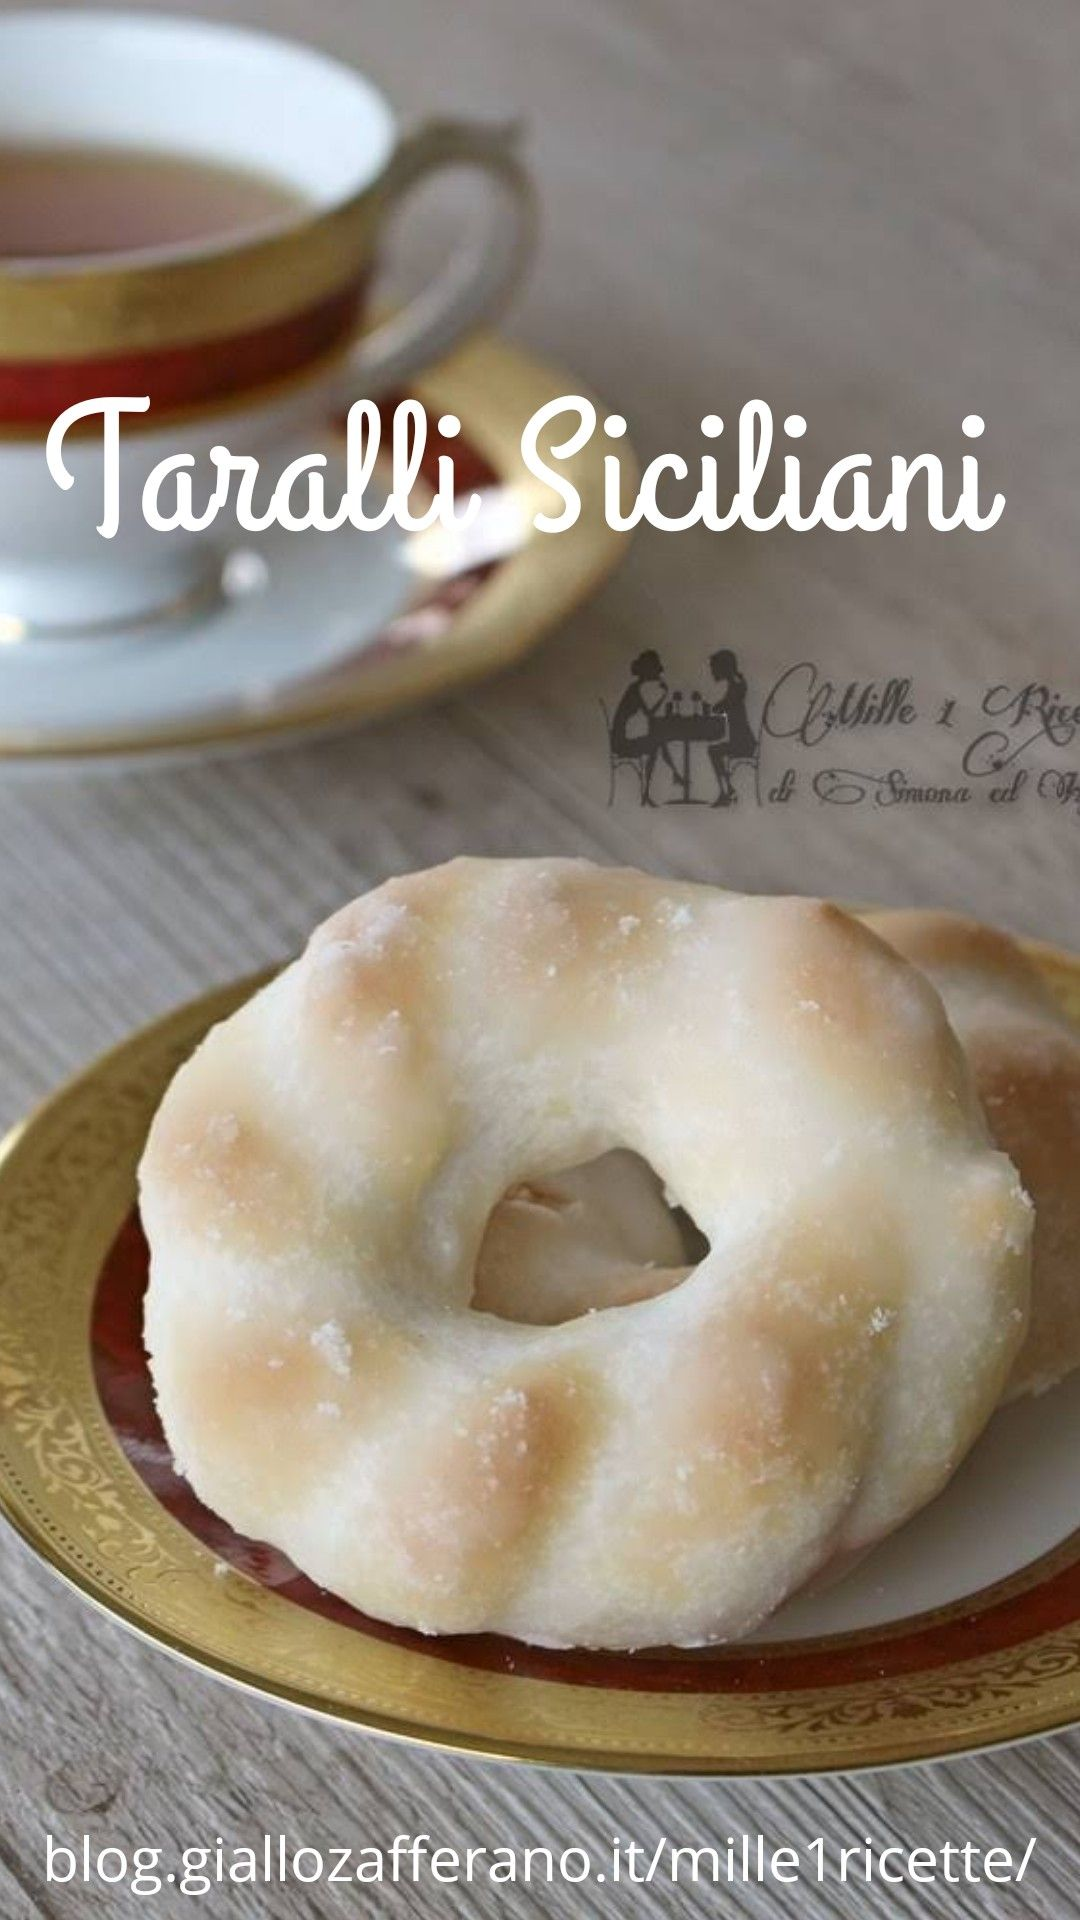 Ricetta Taralli Siciliani.Taralli Siciliani Mille 1 Ricette Ricetta Ricette Ricette Per Biscotti Italiane Ricette Dolci